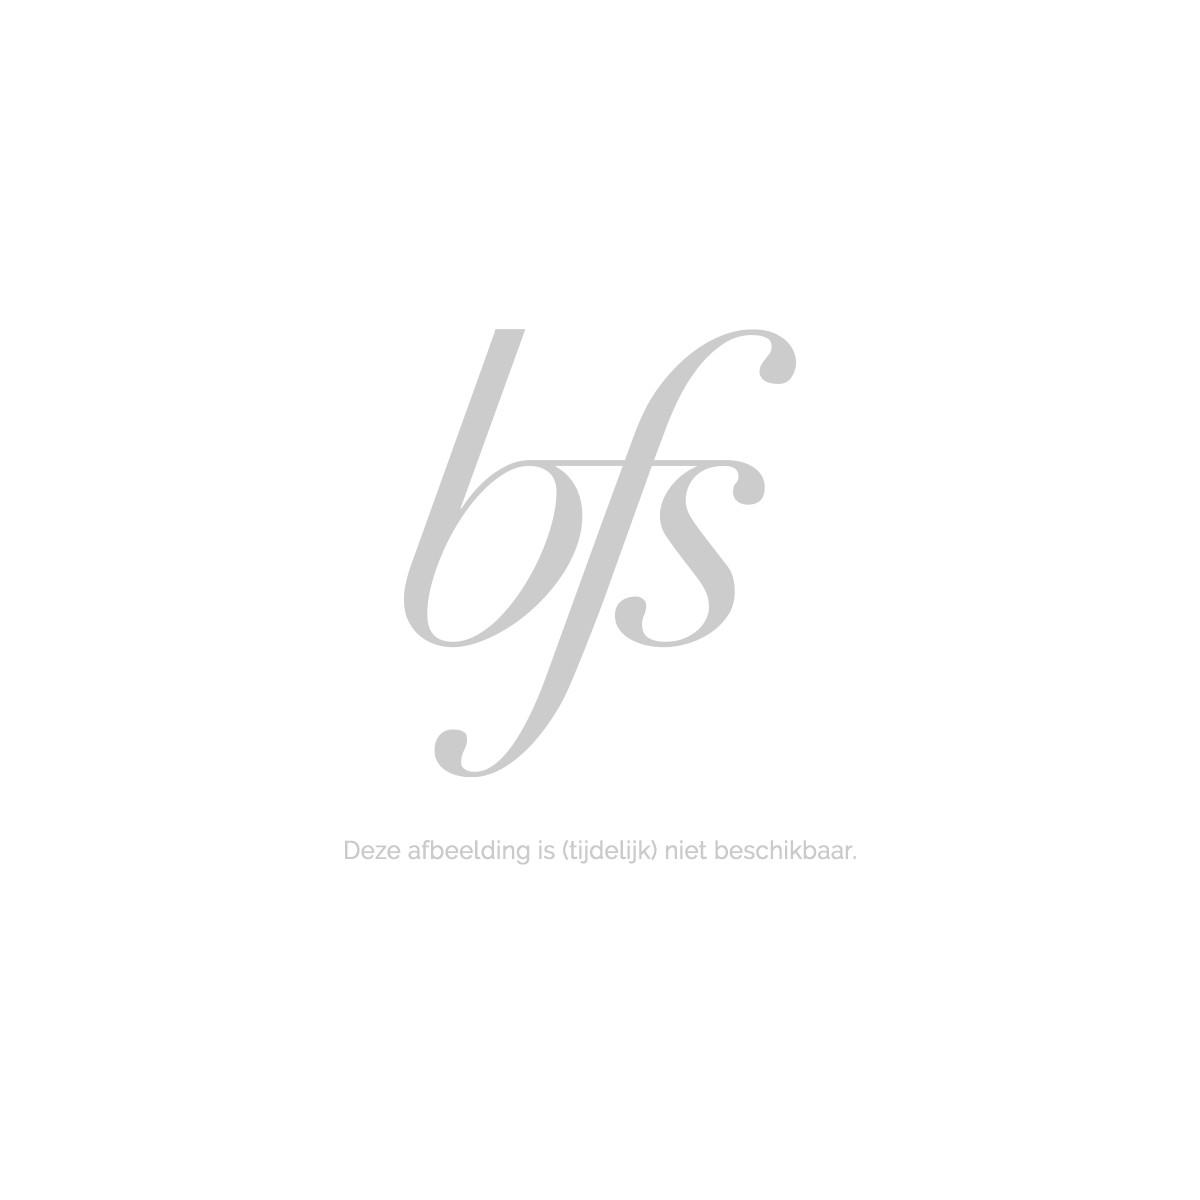 Balm Balm Perfume Bergamot Natural 33Ml